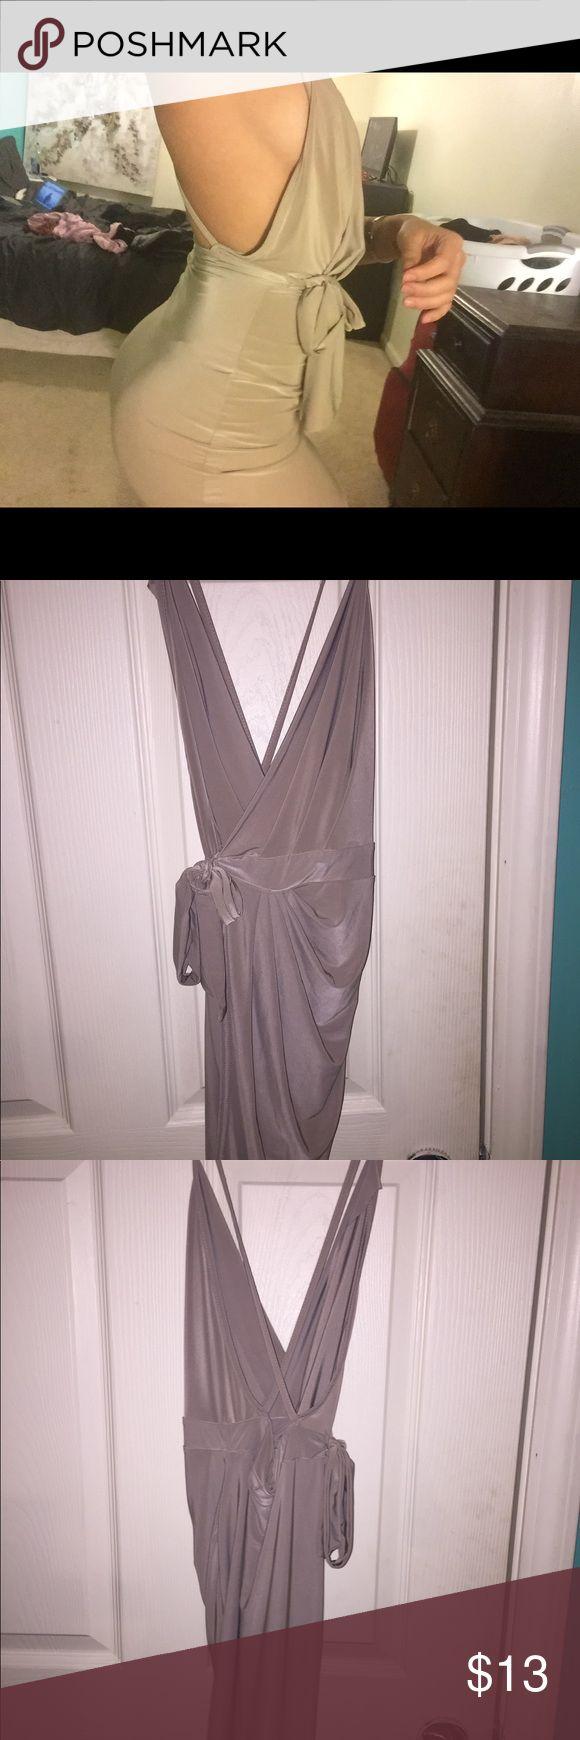 Sexy slinky tan wrap bodycon dress Sexy slinky tan wrap bodycon dress! Fits amazing and makes your curves pop! Purchased from BOOHOO PETITE Boohoo Dresses Mini